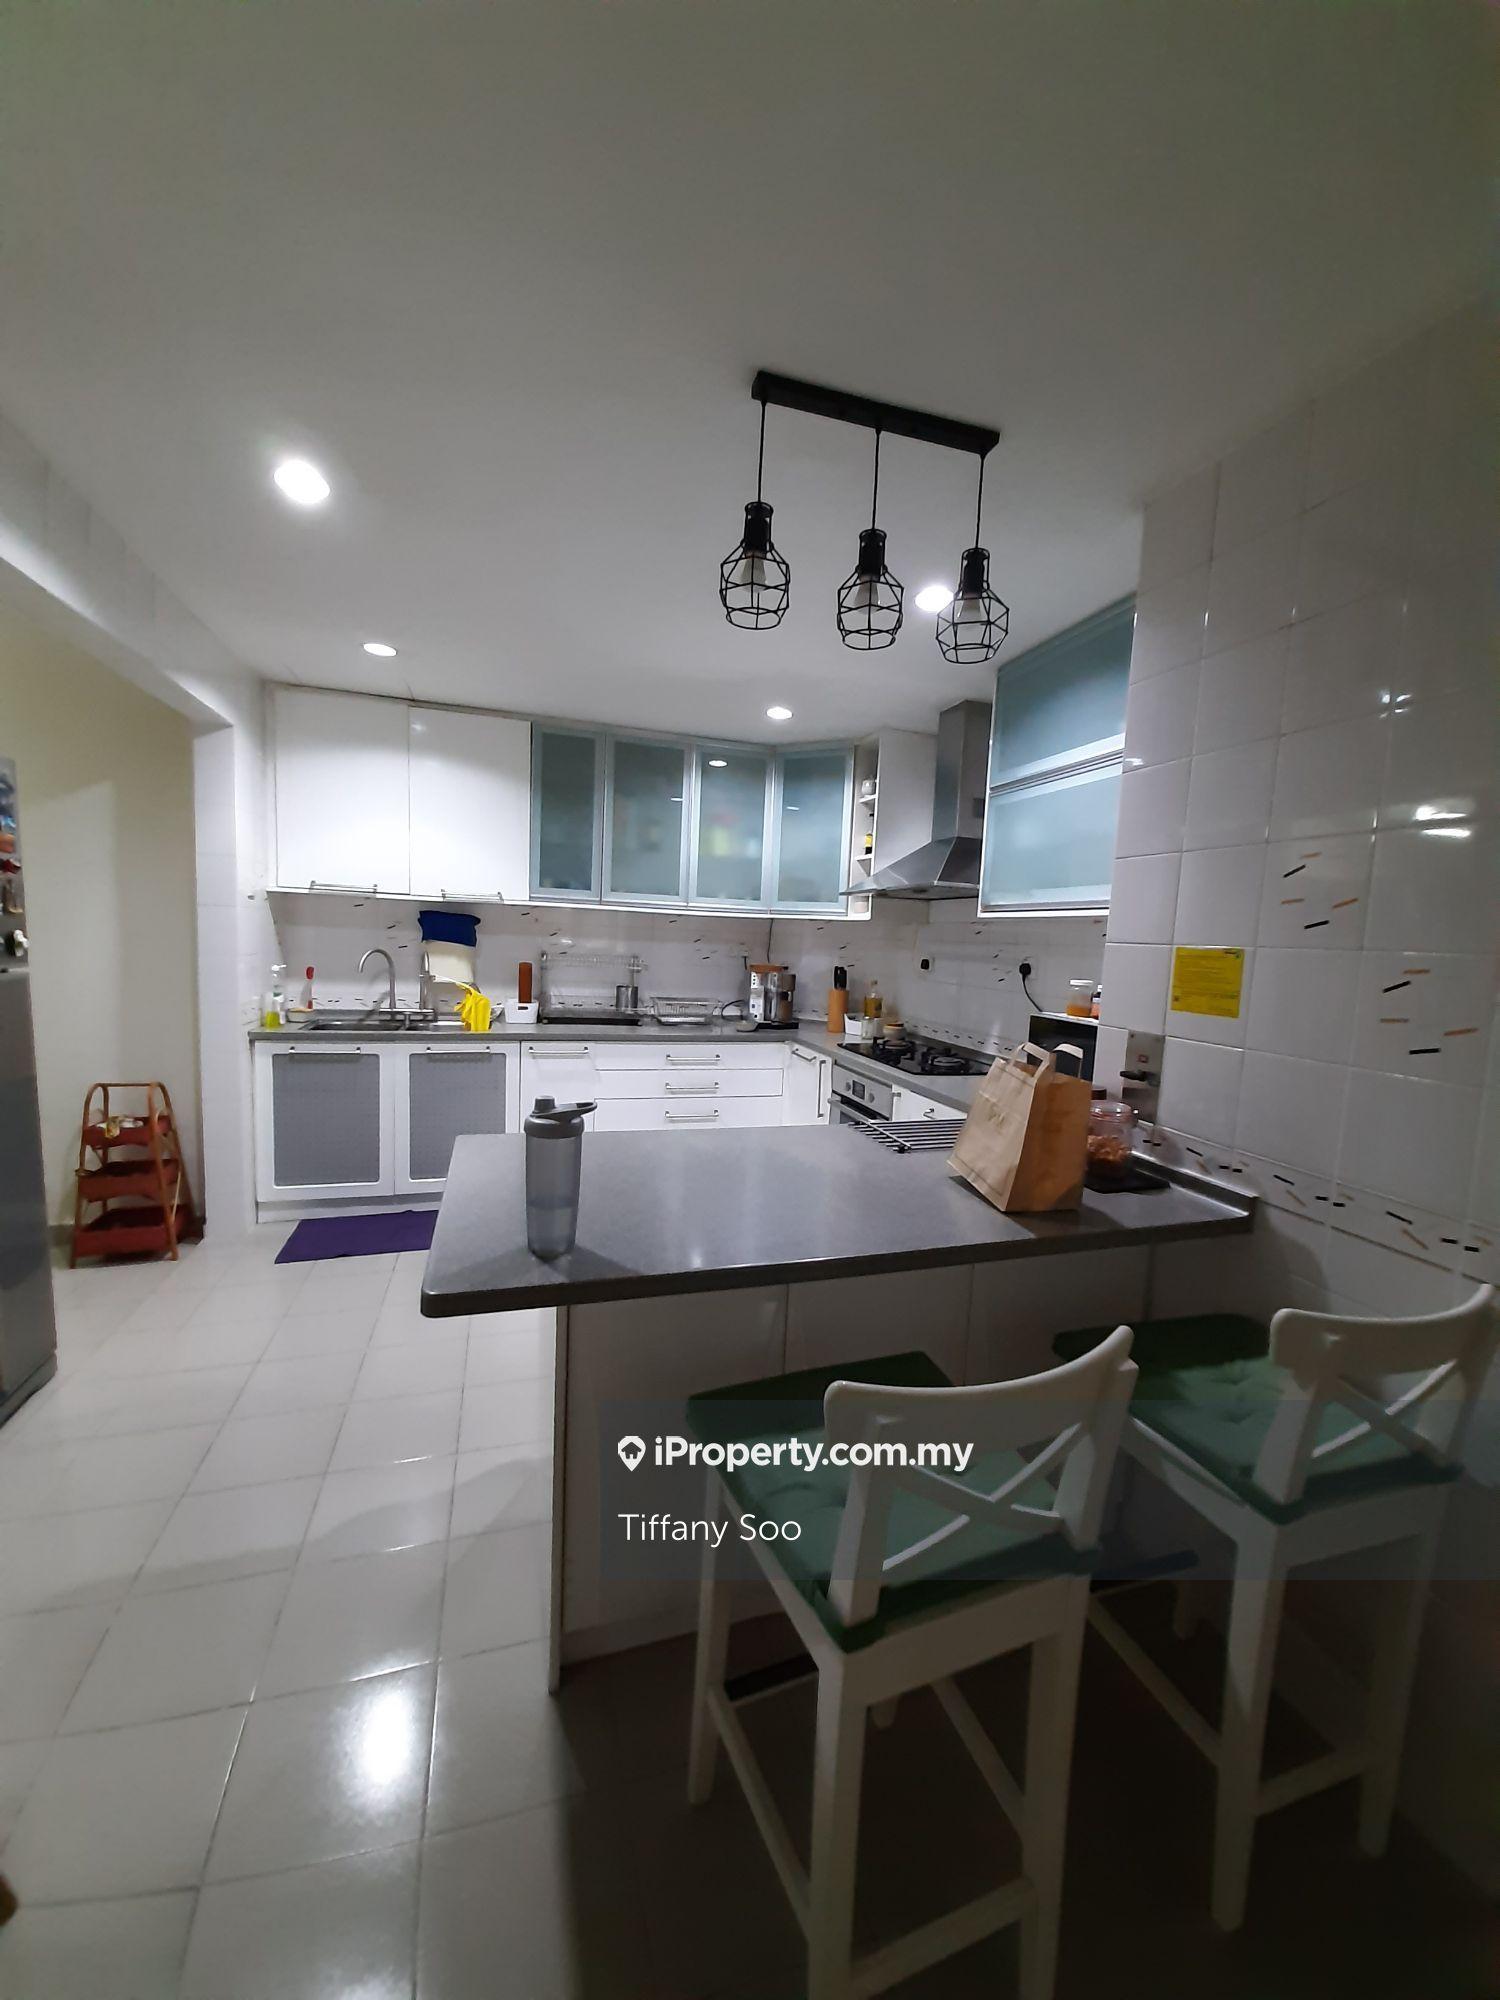 Damansara Villa, Damansara Heights